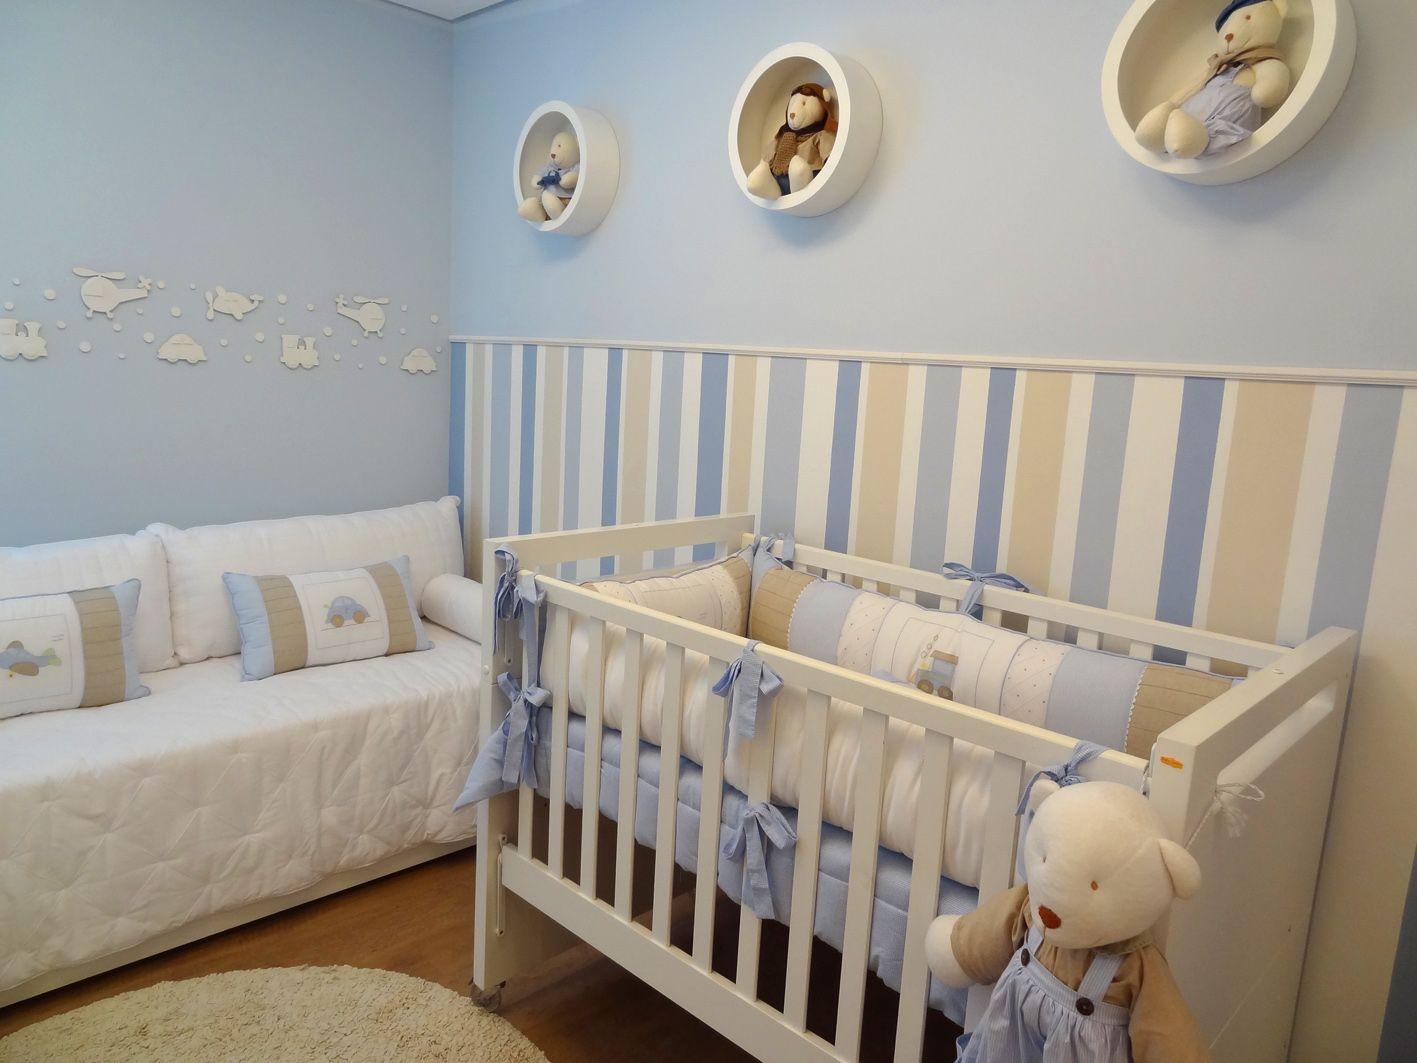 quarto de bebê azul com listras | Cuarto del bebe | Pinterest | El ...